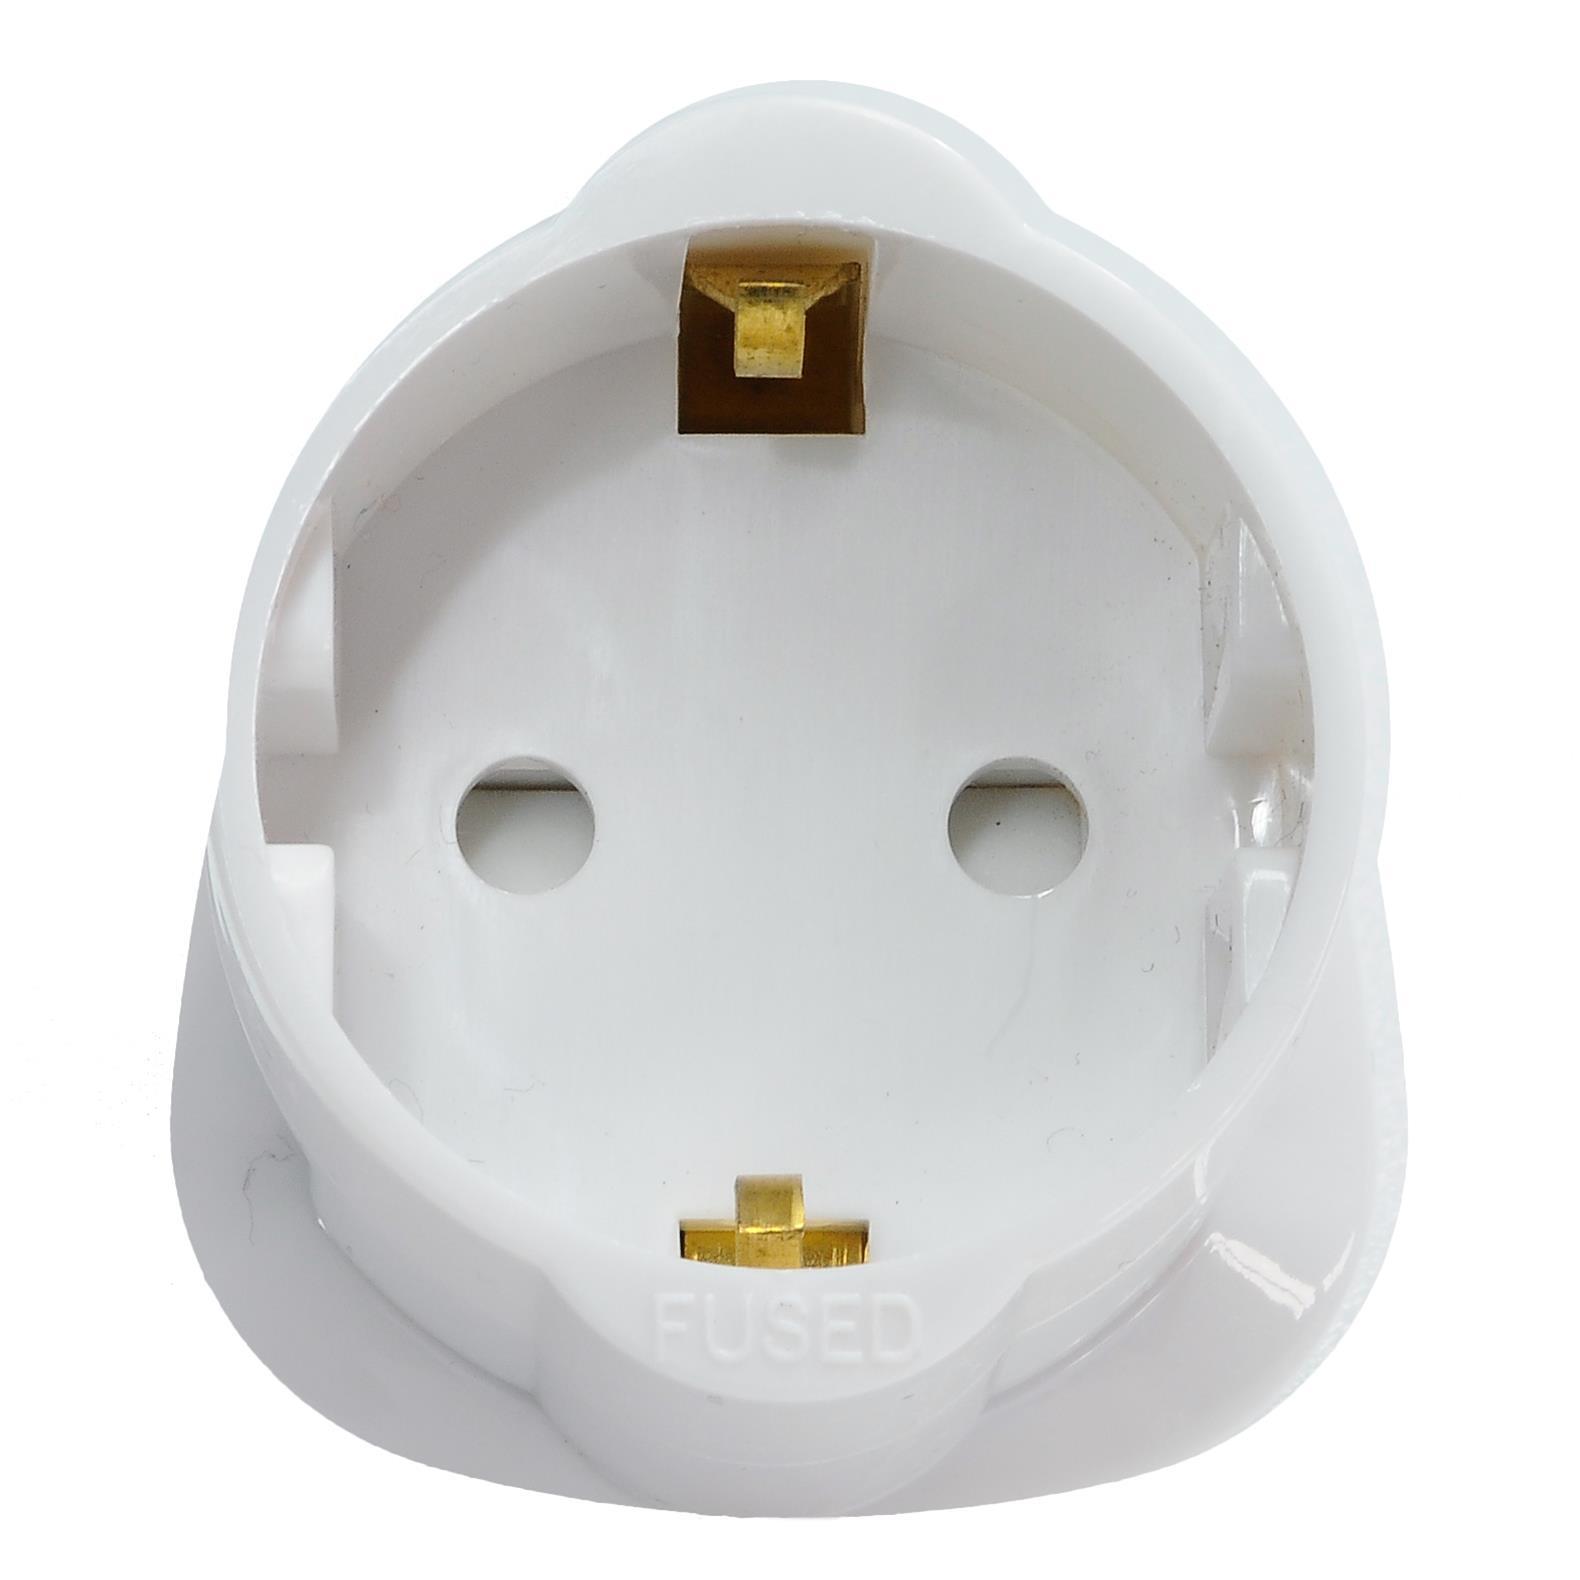 Travel Plug Adaptor 13A 2 pin to 3 pin | Wireless Radio Technology